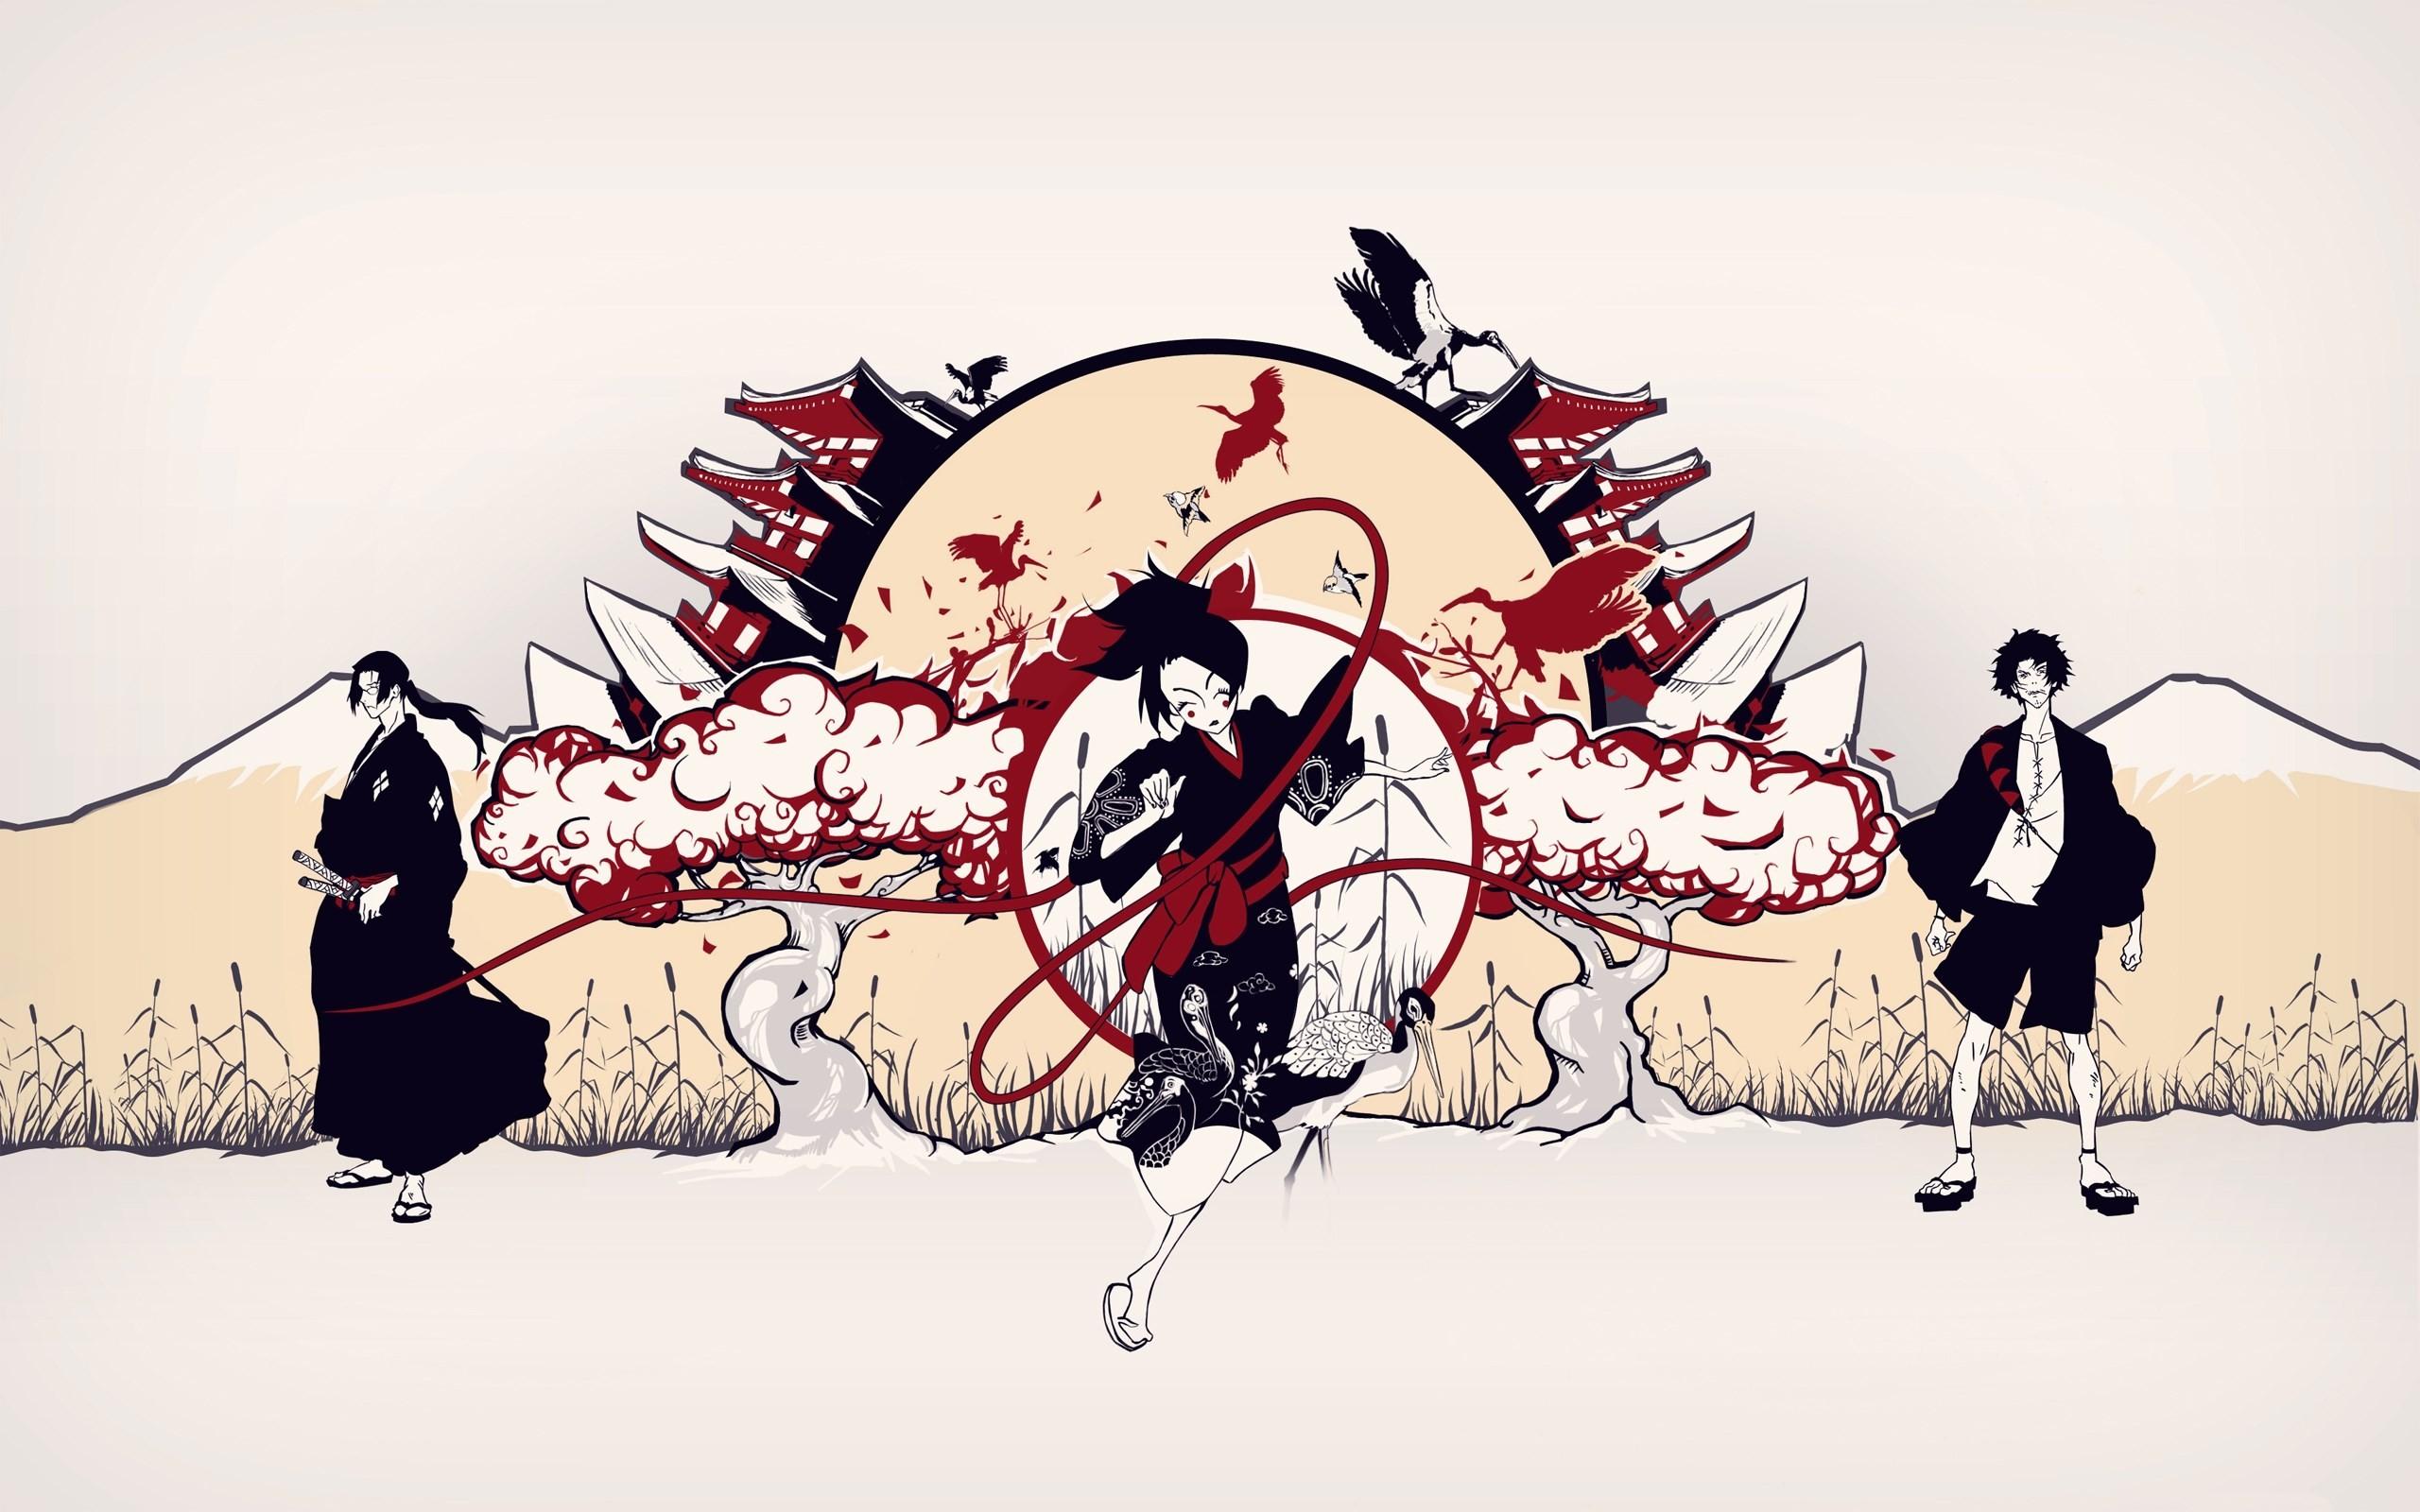 Explore Hd Wallpaper, Wallpapers, and more! samurai champloo …